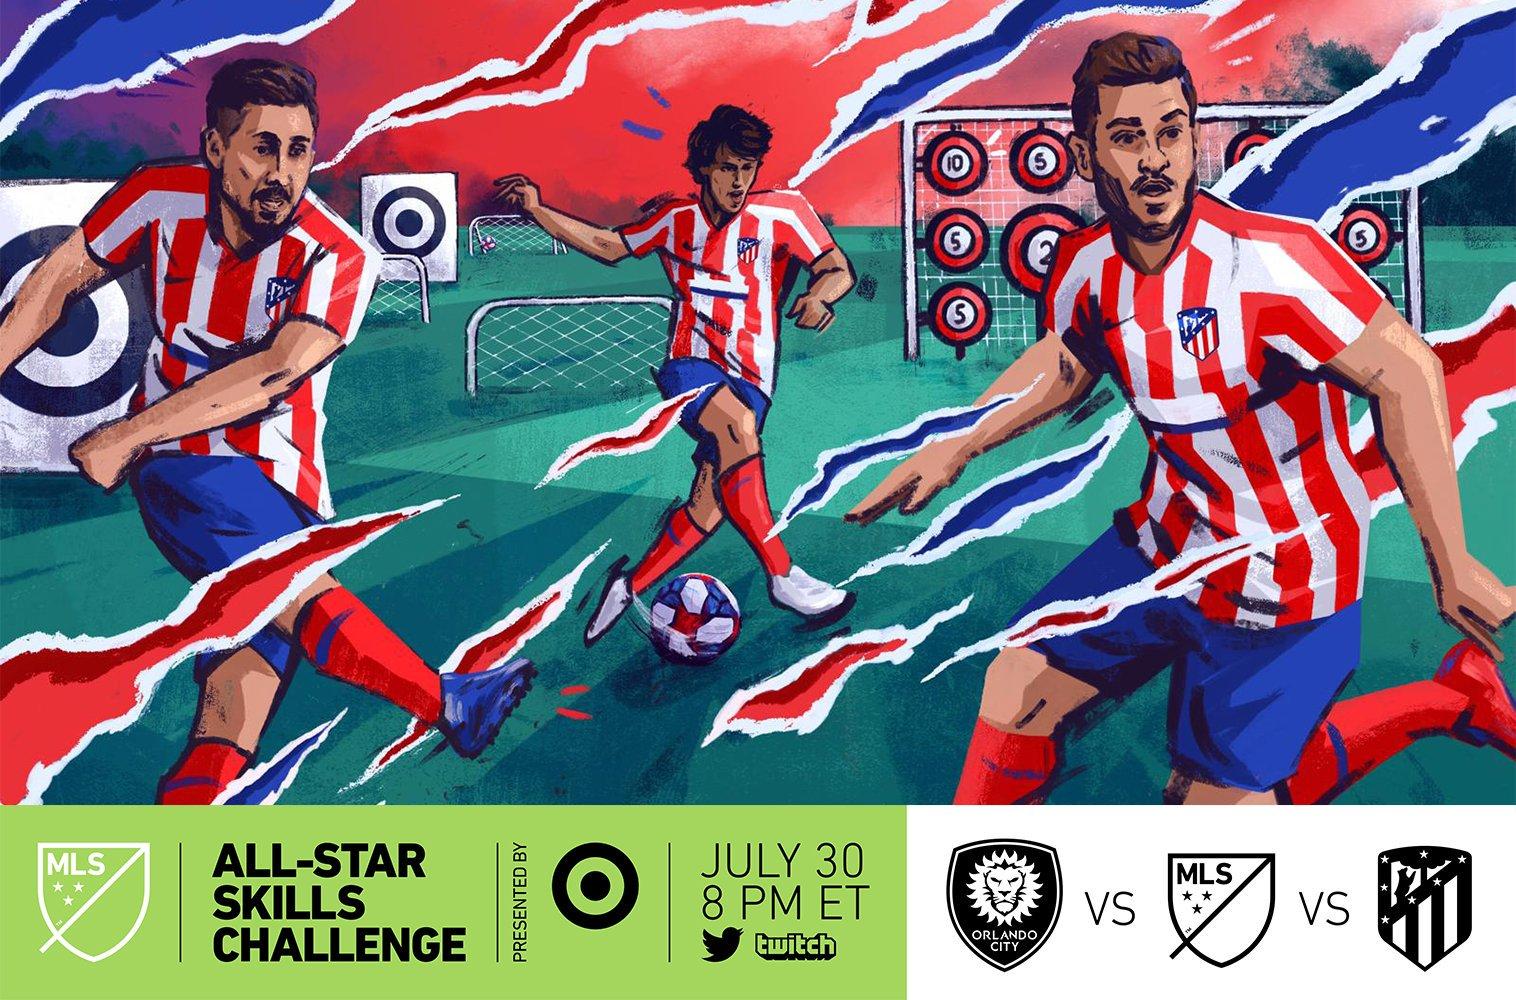 MLS skills challenge